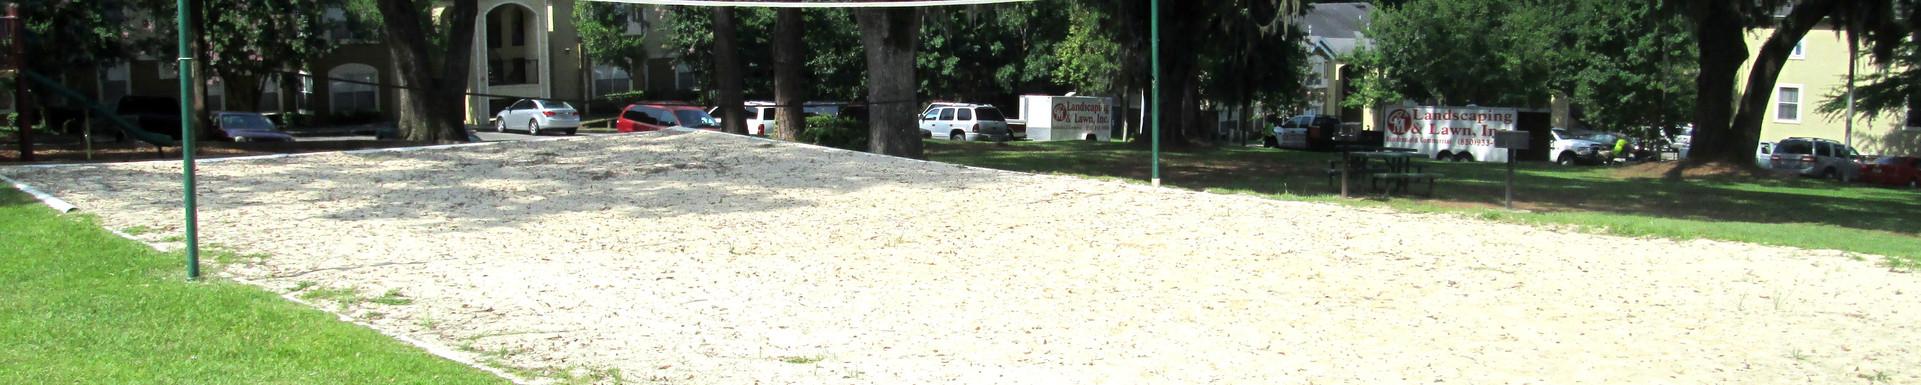 Glen Oaks Apartments Volley Ball Court